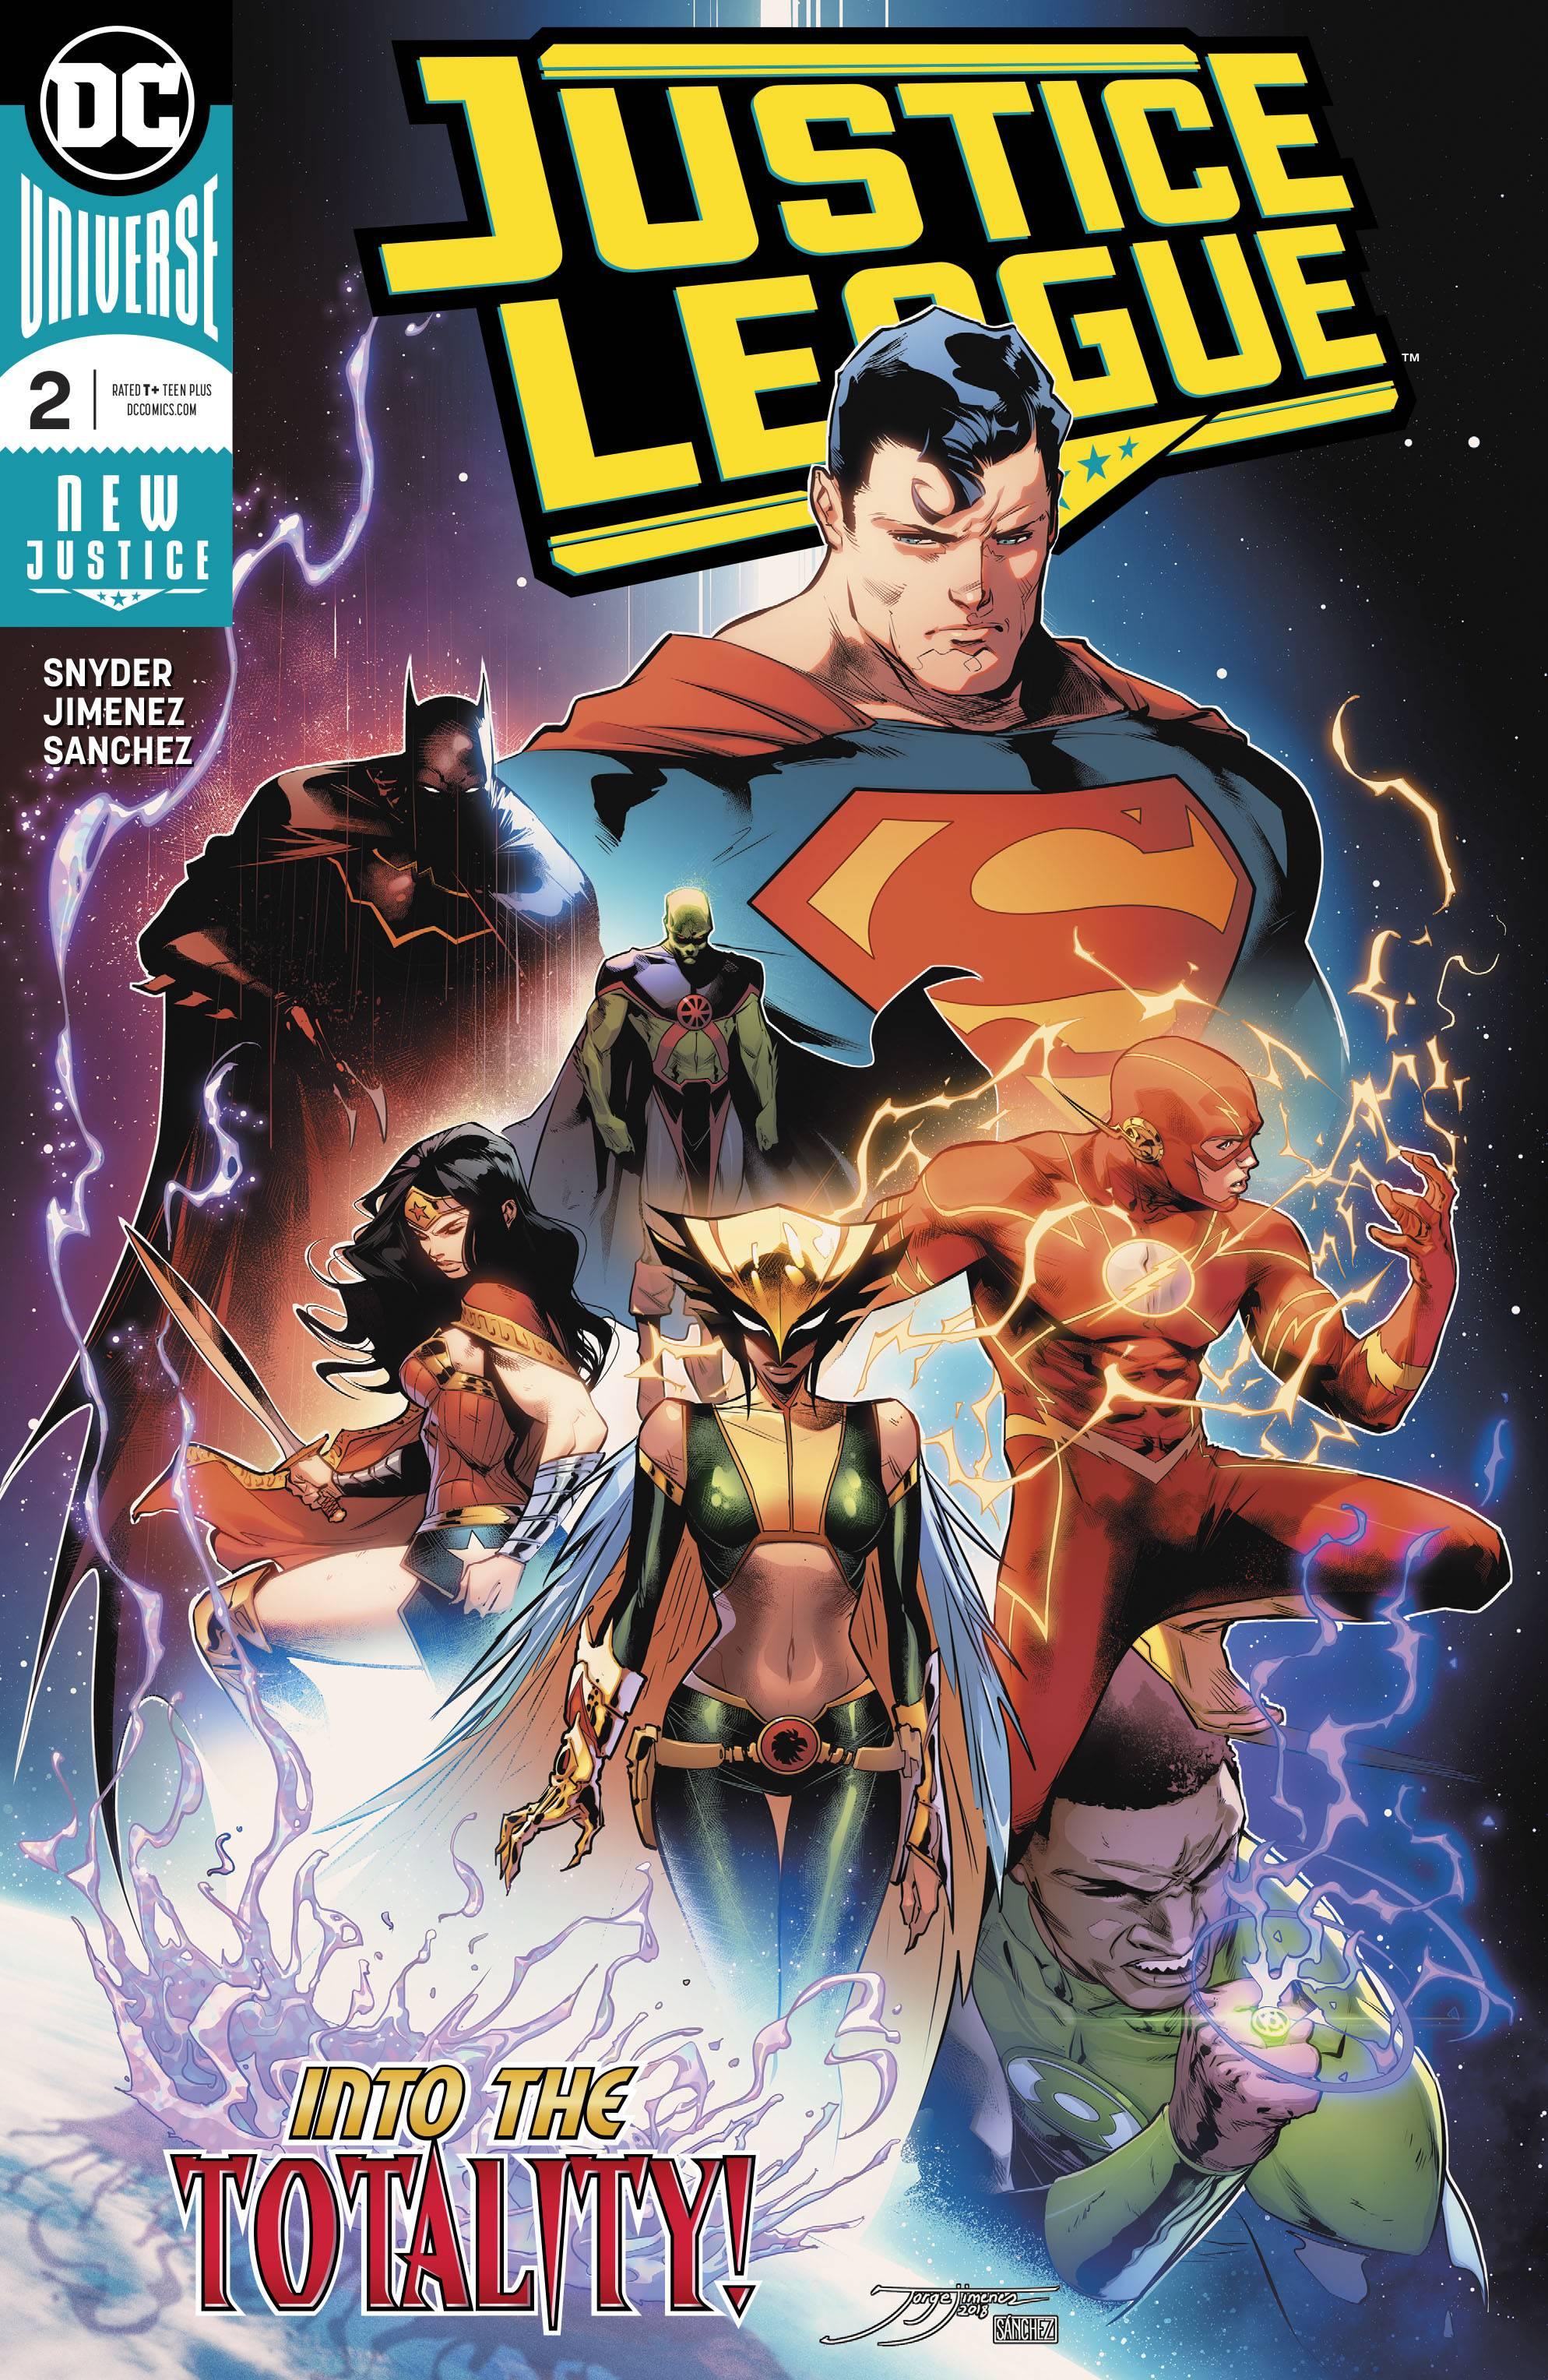 Justice League #2, June 2018